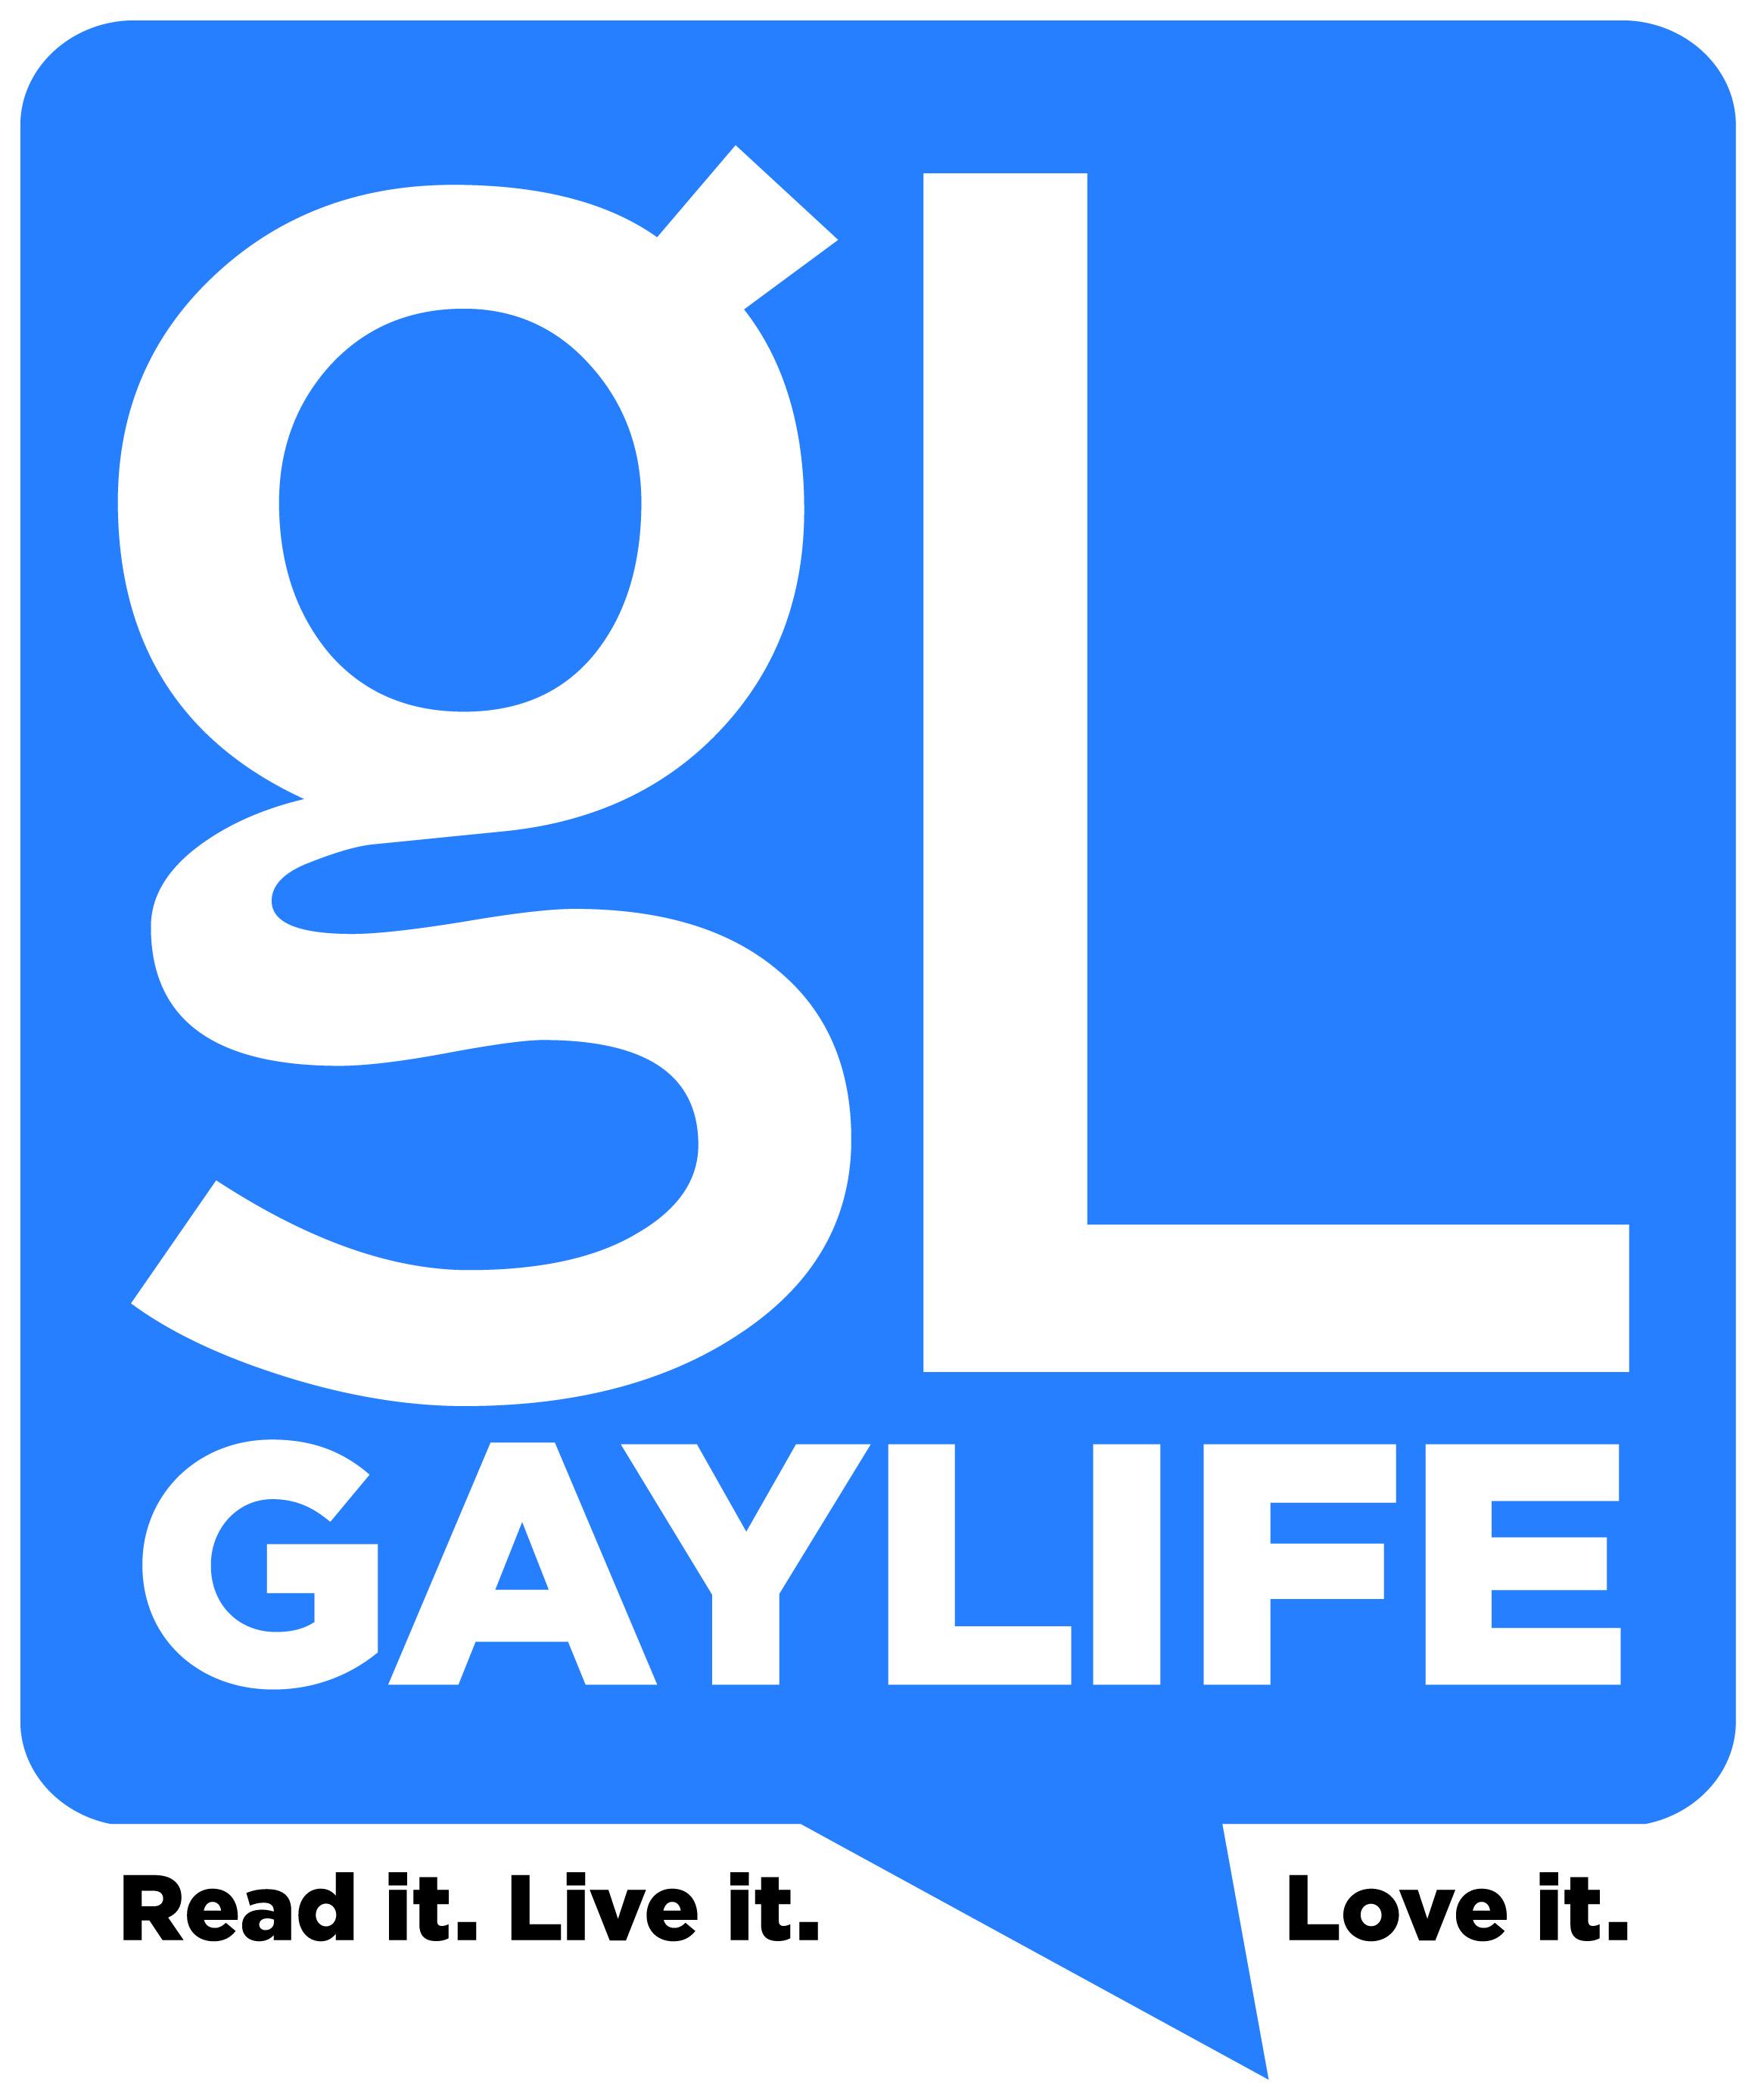 Baltimore Gay Life Logo